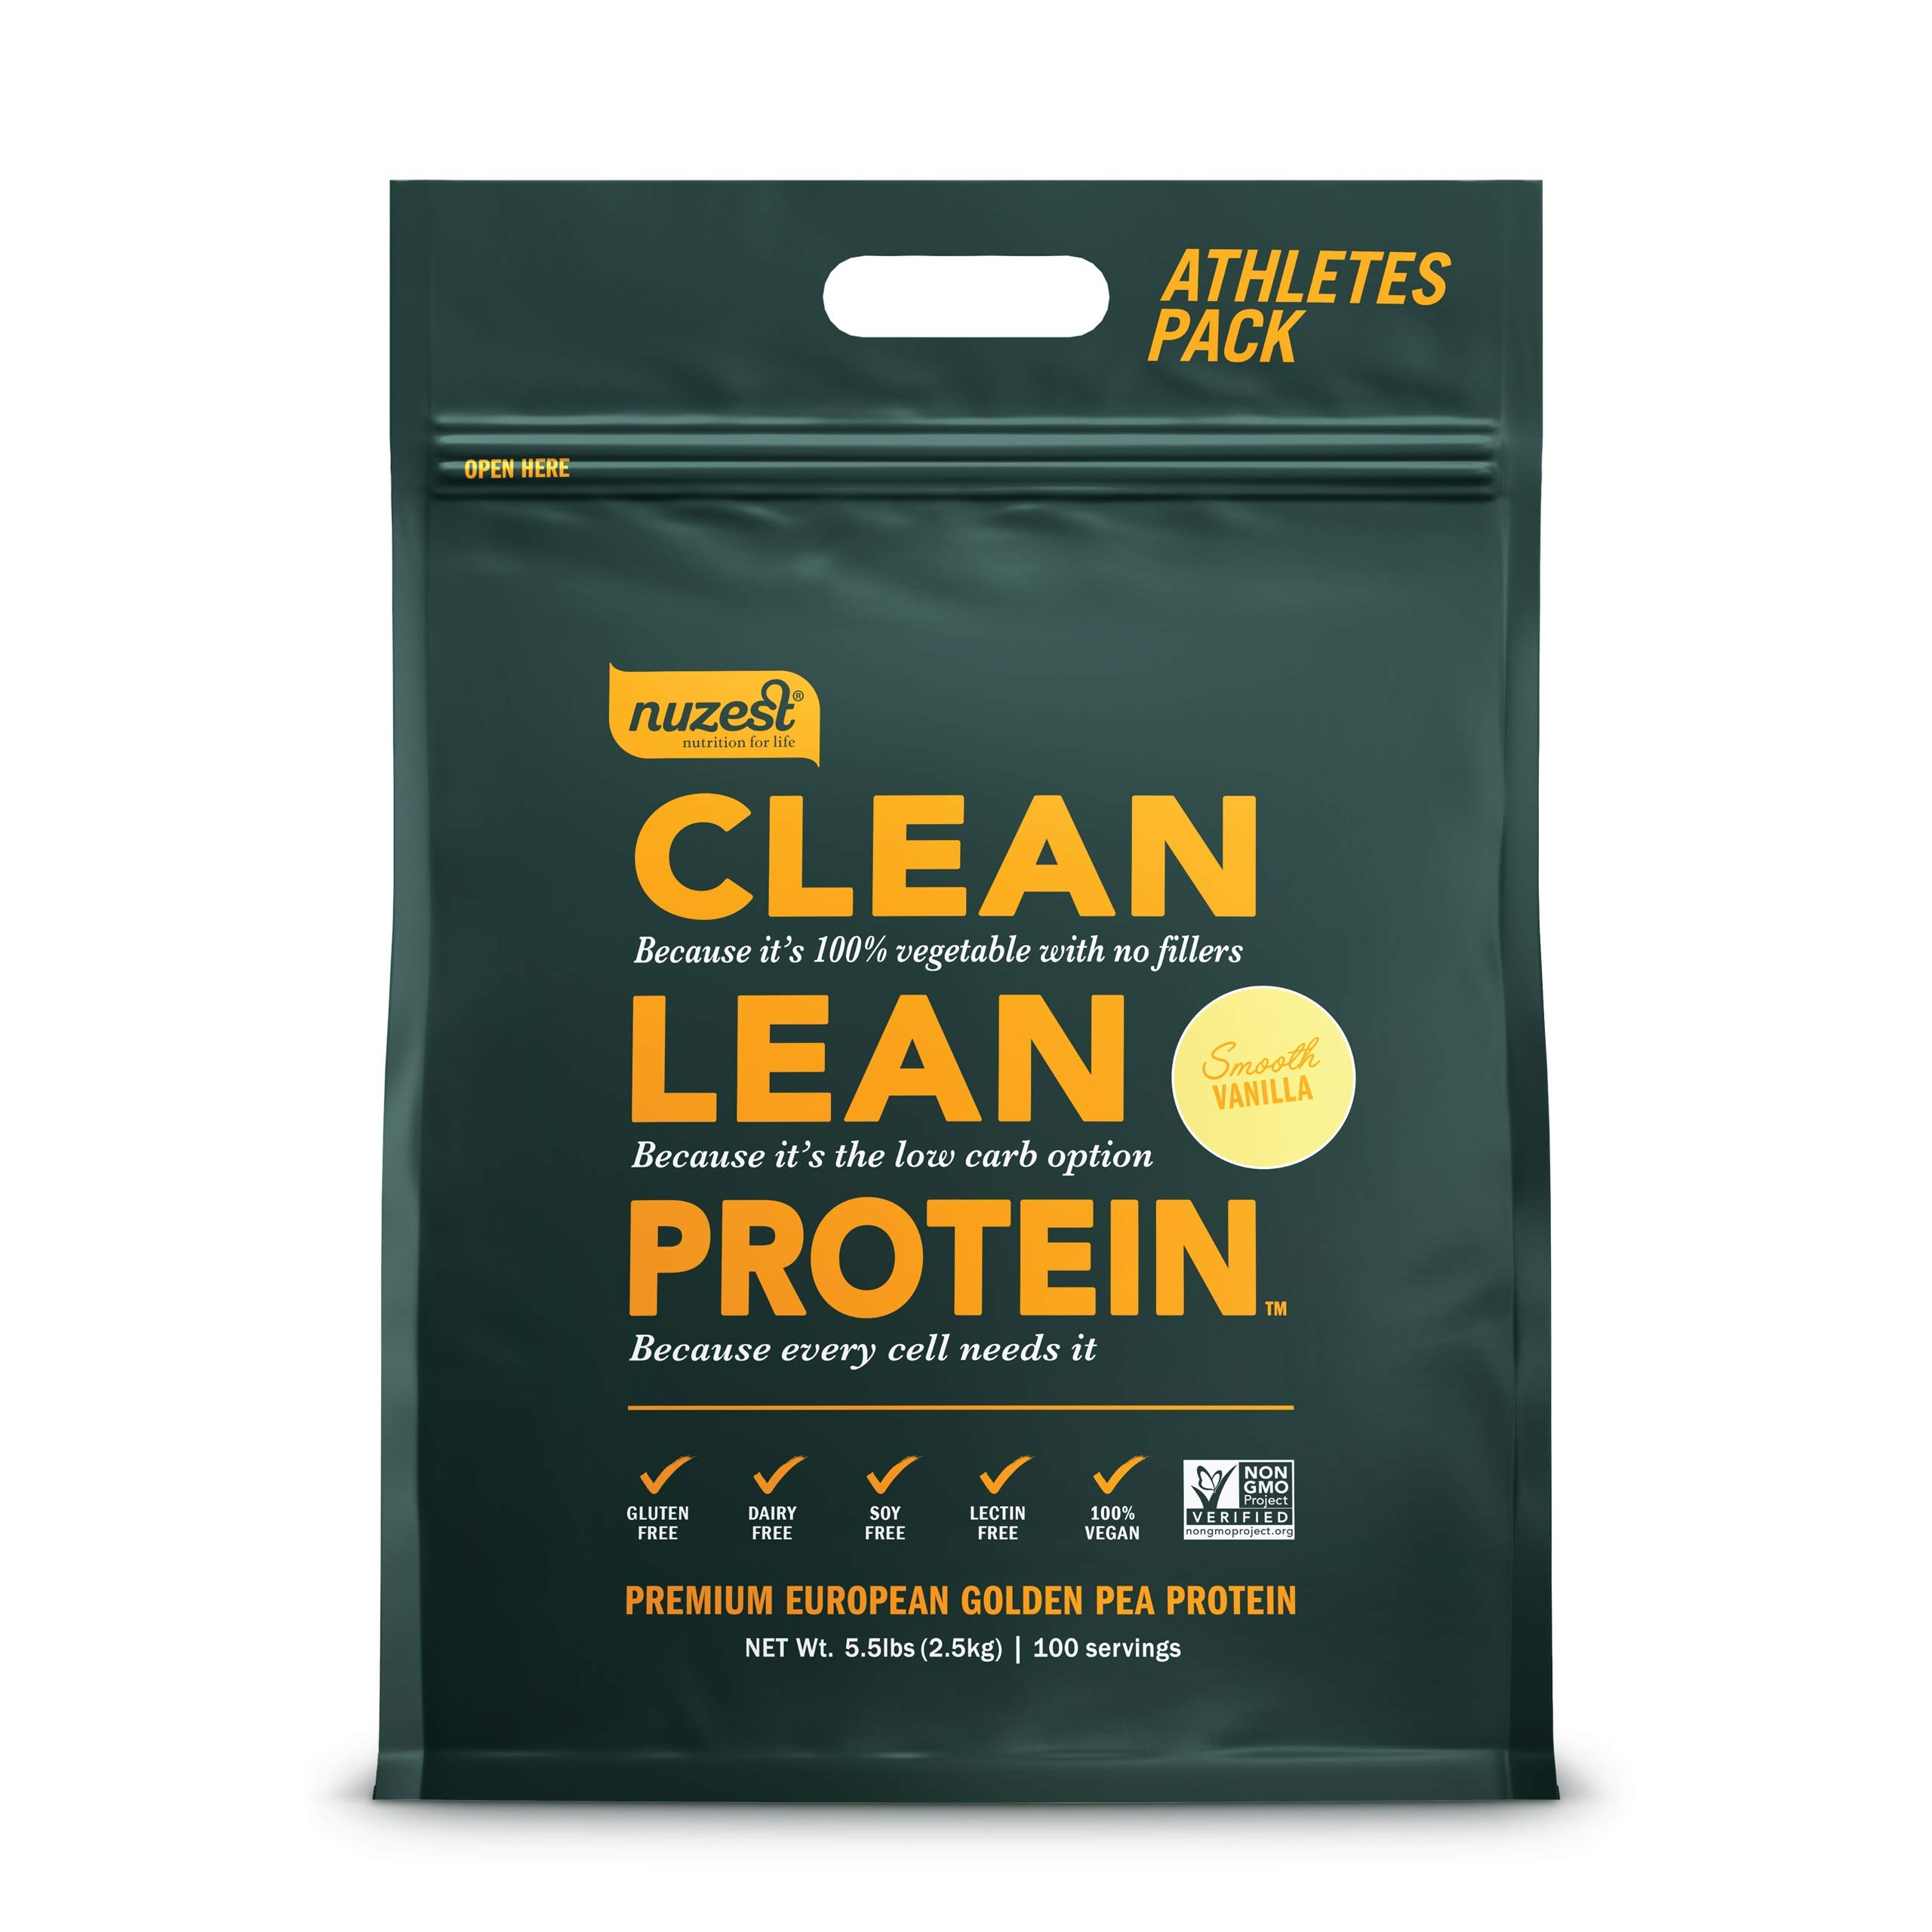 Nuzest Clean Lean Protein - Premium Vegan Protein Powder, Plant Protein Powder, European Golden Pea Protein, Dairy Free, Gluten Free, GMO Free, Naturally Sweetened, Smooth Vanilla, 100 Servings, 5.5lb by NuZest